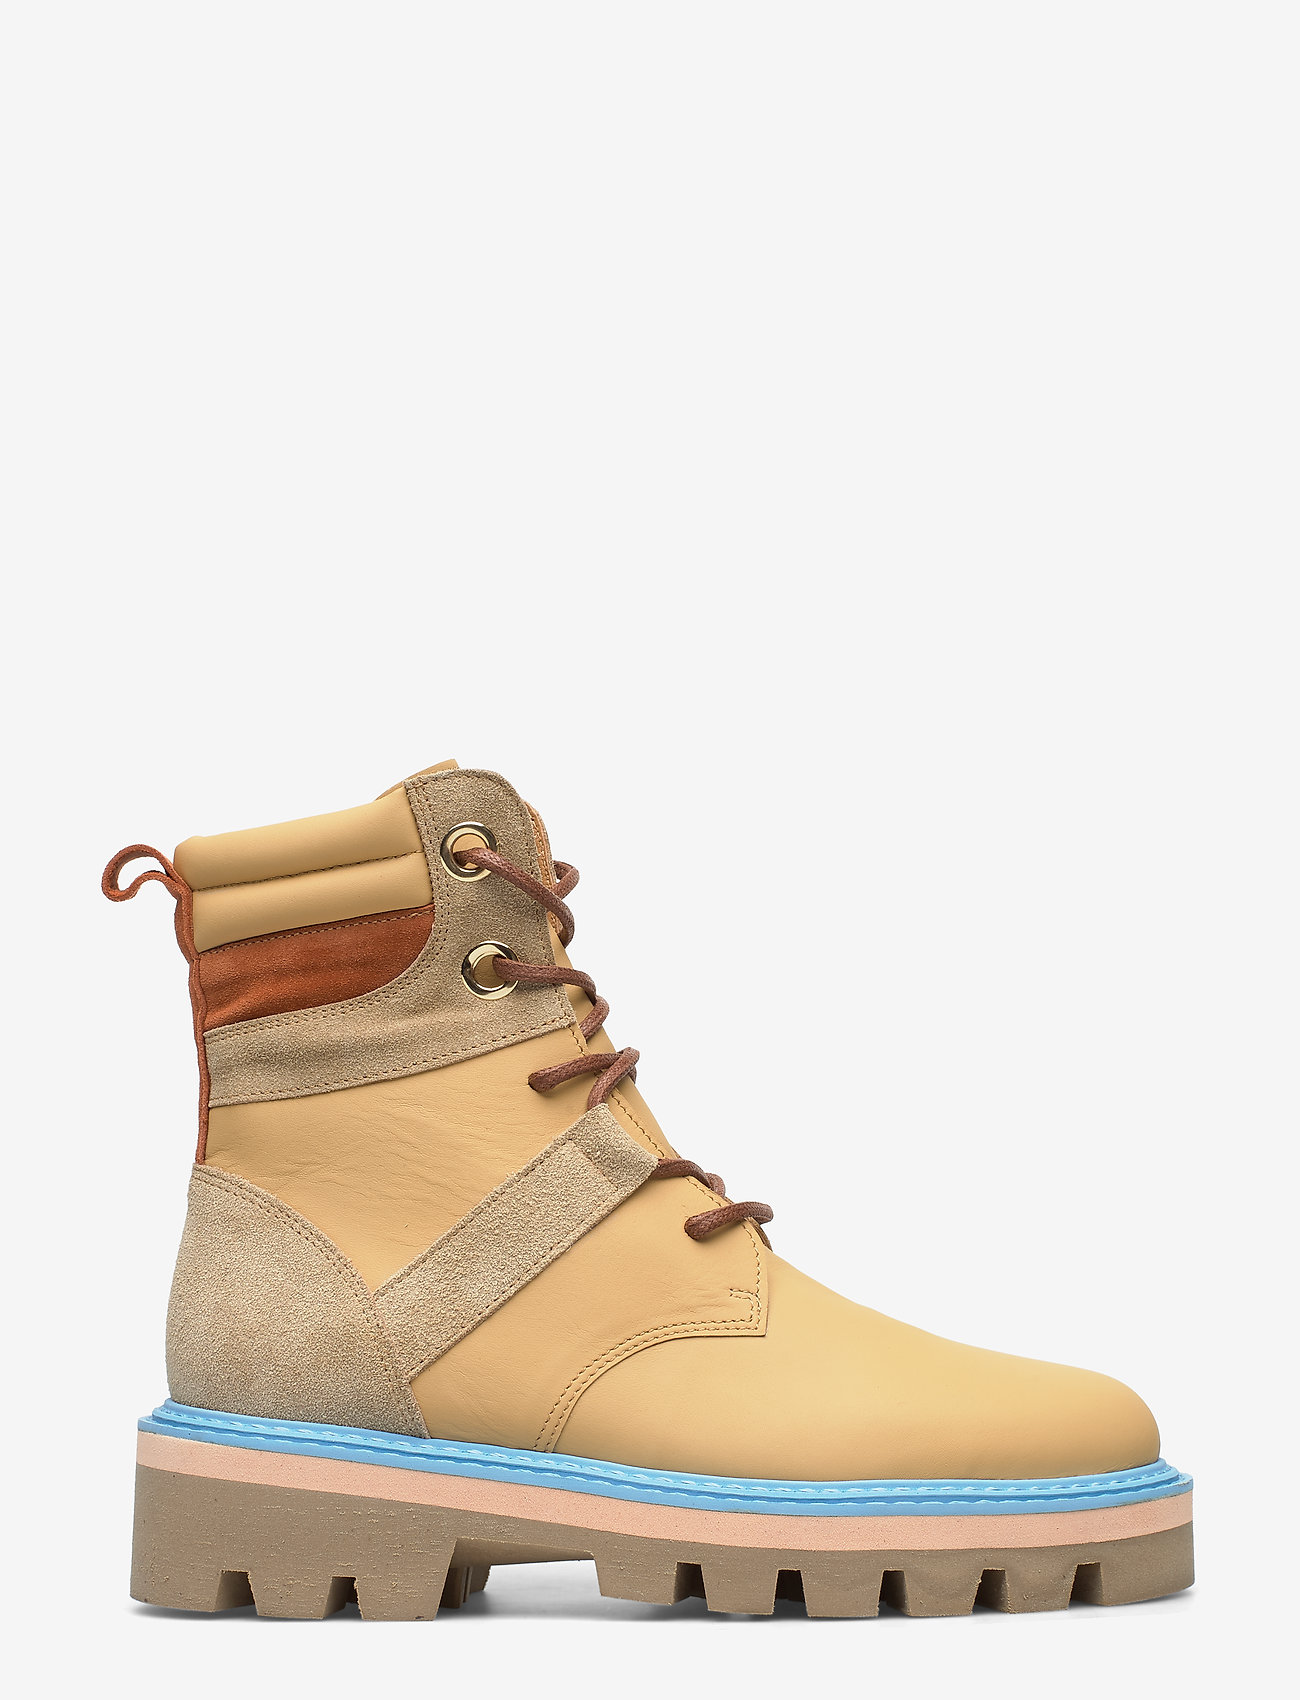 Gilda, 672 Vanilla Shoes (Vanilla) - STINE GOYA IBE7zh